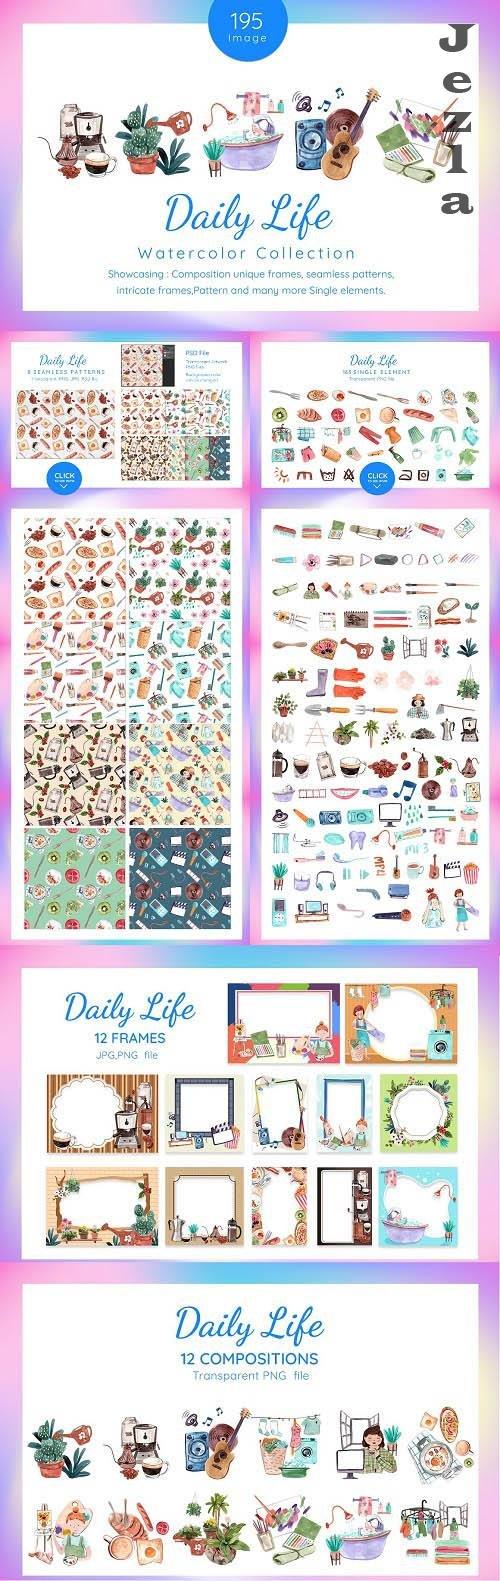 Daily Life at Home Watercolor - 6245881